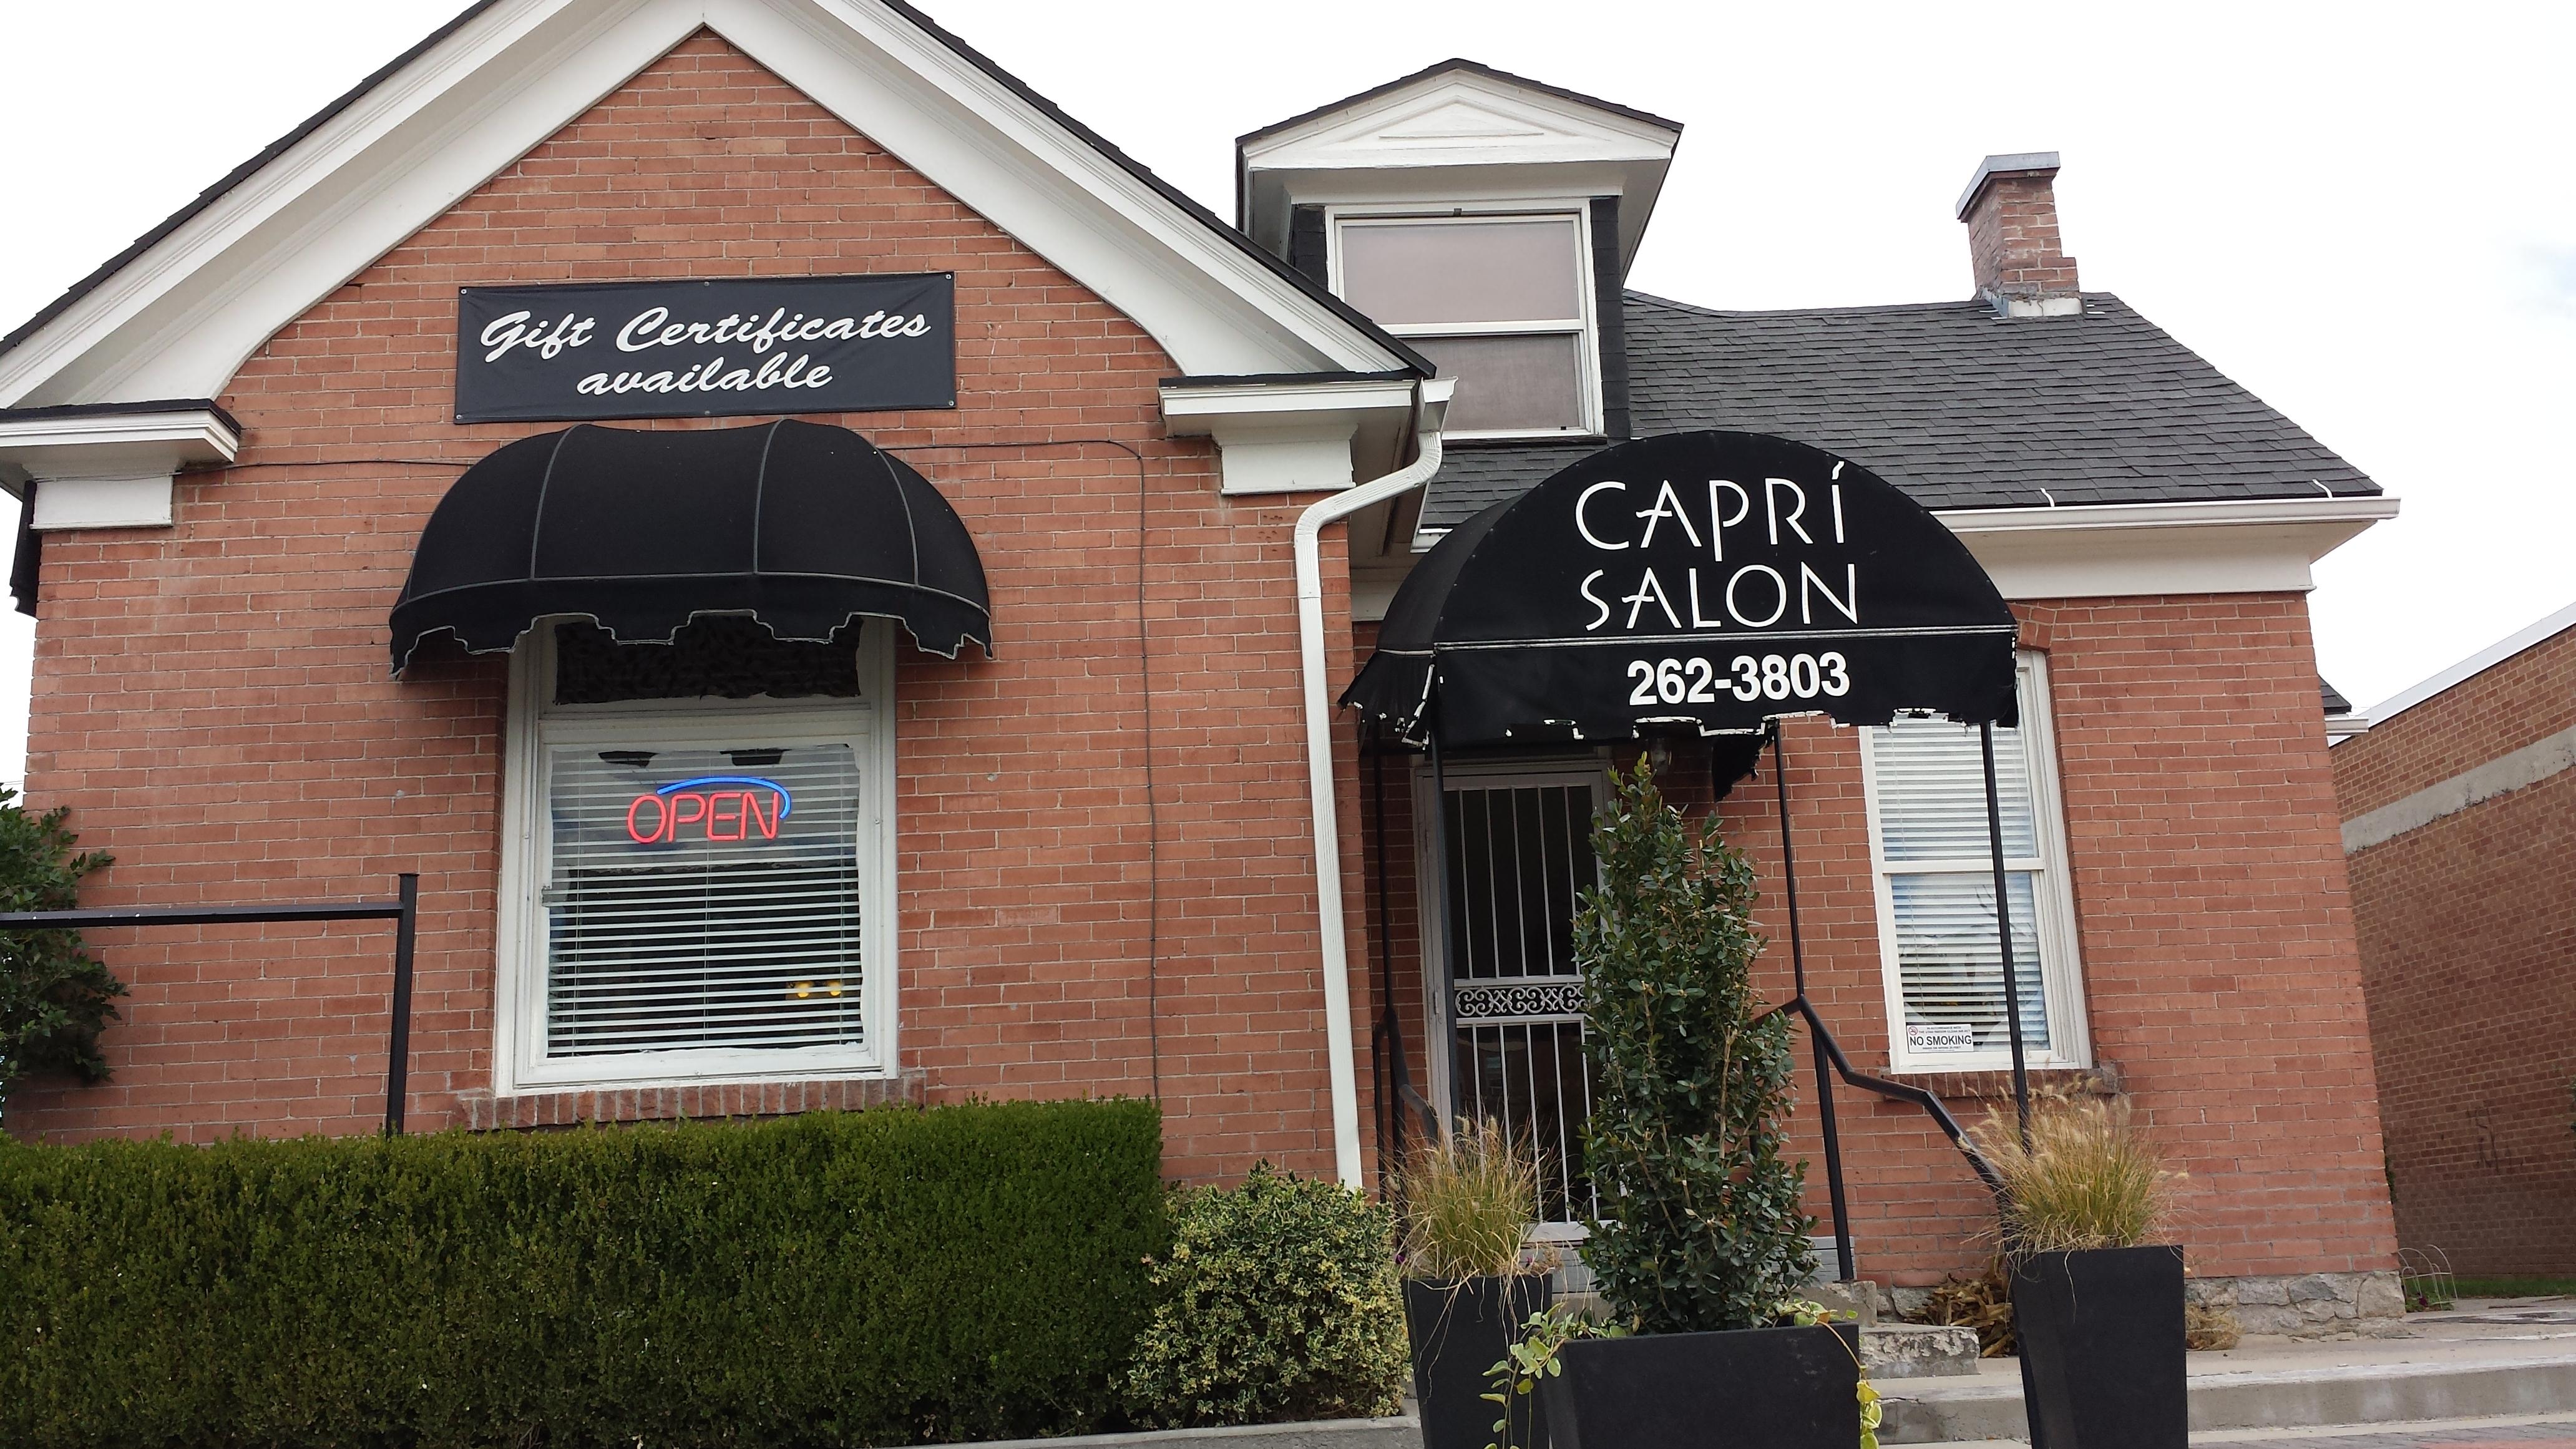 Capri Salon & Day Spa 4841 S State St, Salt Lake City, UT